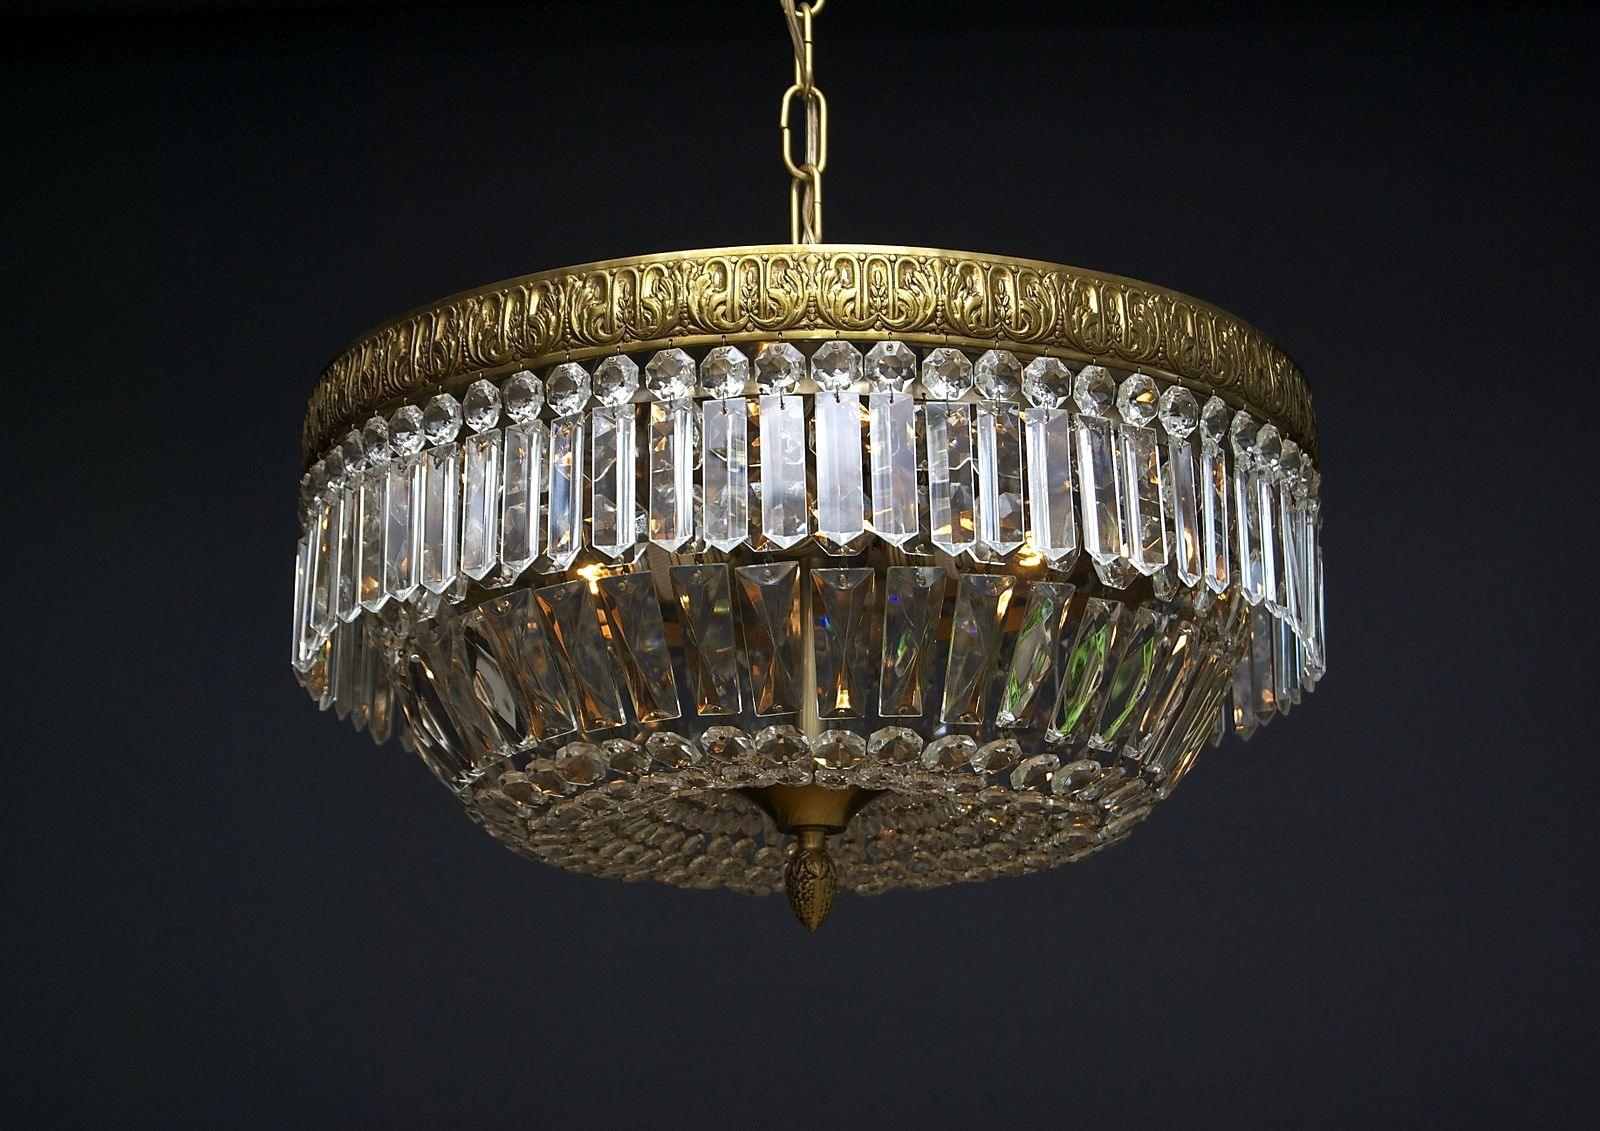 Kristallen Plafonniere : Grote kristallen plafonnière met 4 lichtpunten lamps